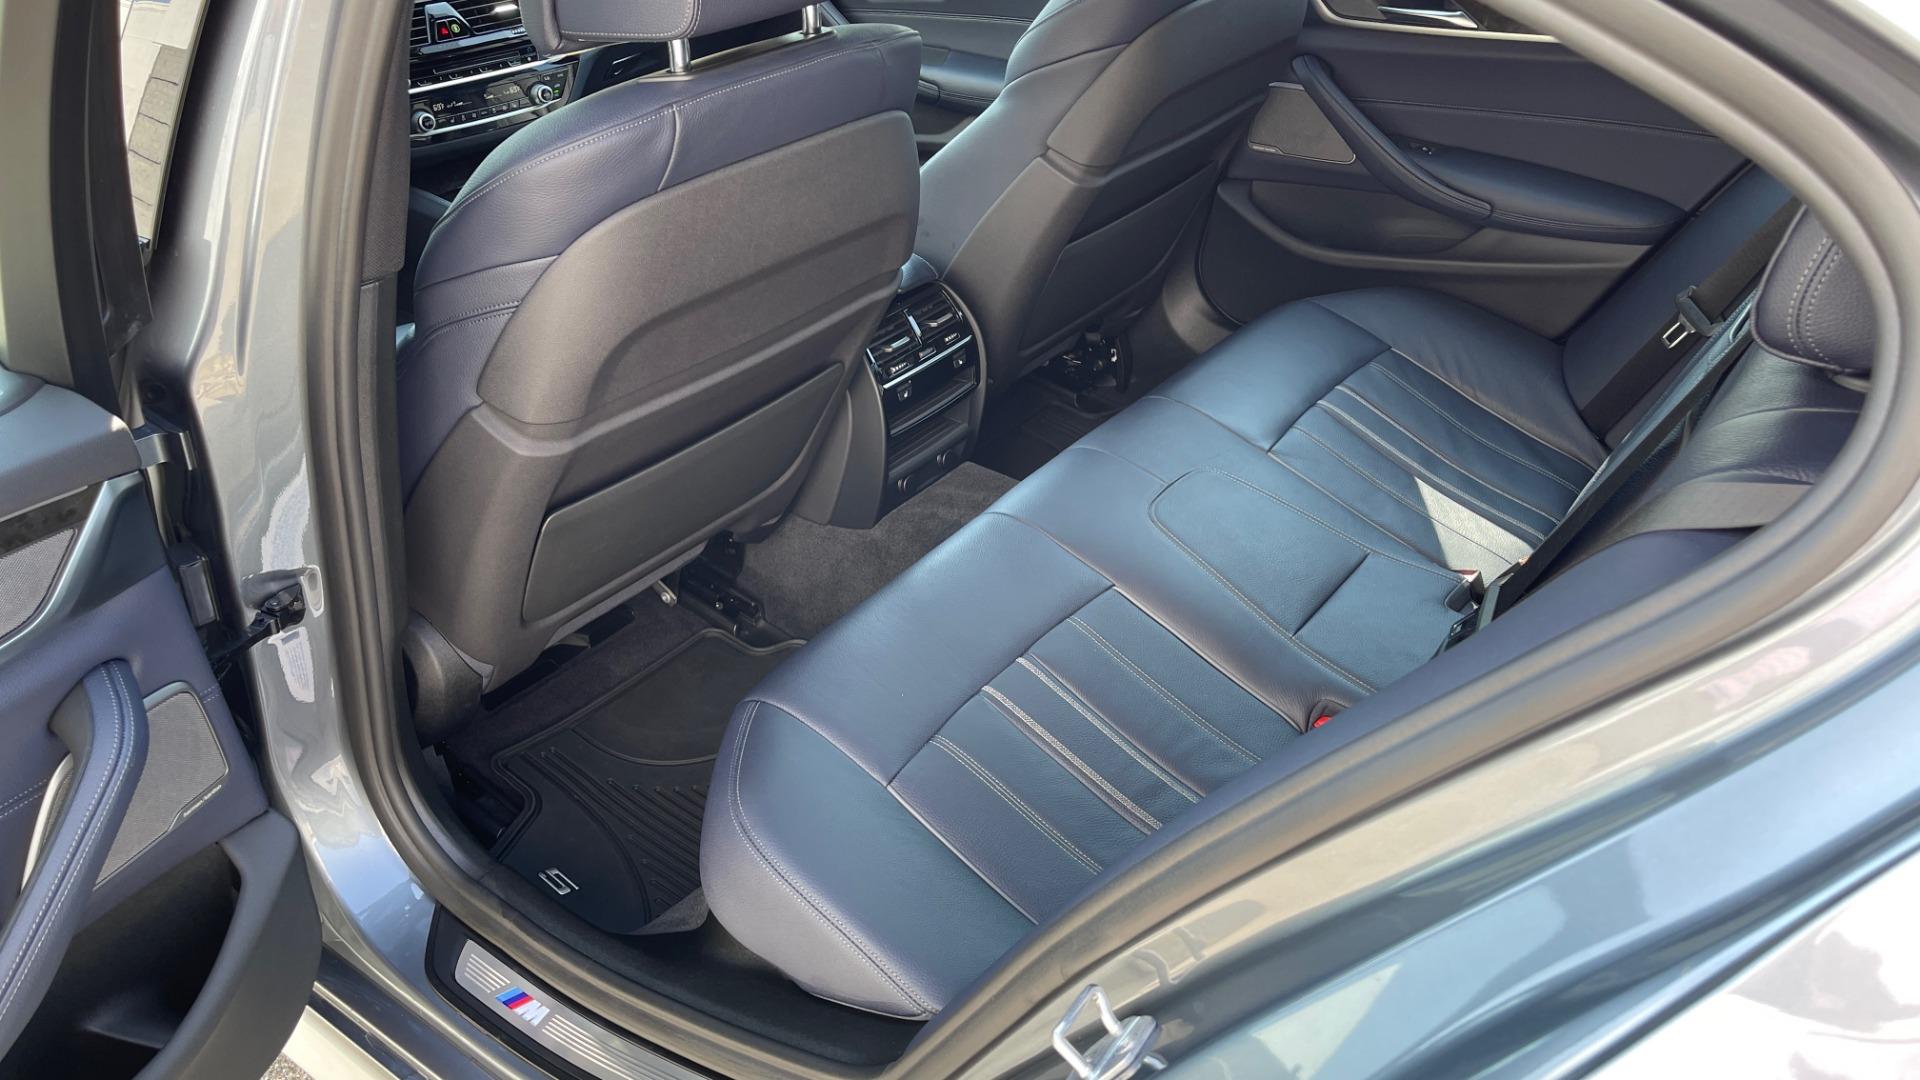 Used 2018 BMW 5 SERIES 540I XDRIVE M-SPORT / DRVR ASST / PDC / APPLE / HUD / H/K SND for sale $42,795 at Formula Imports in Charlotte NC 28227 54